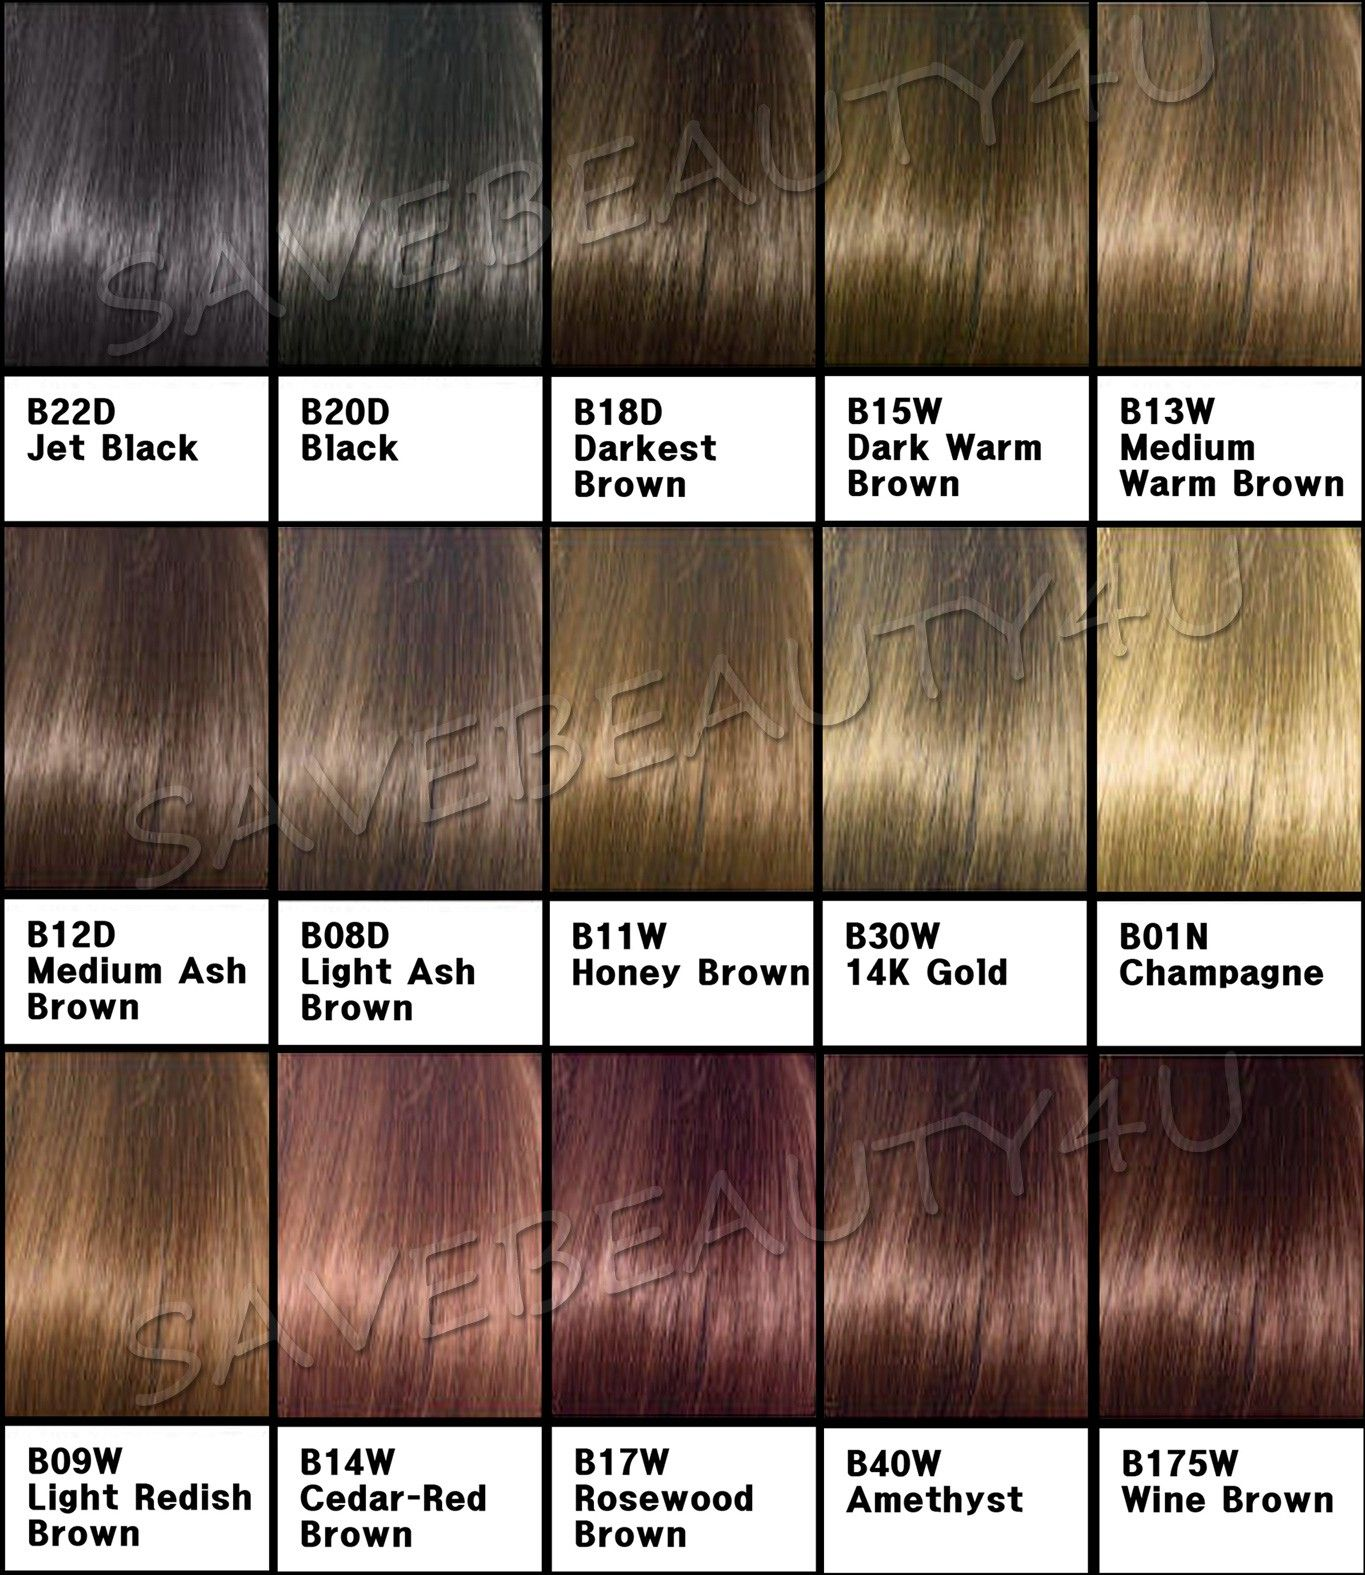 Image Result For Light Ash Brown Hair Color Chart Light Ash Brown Hair Light Ash Brown Hair Color Brown Hair Color Chart